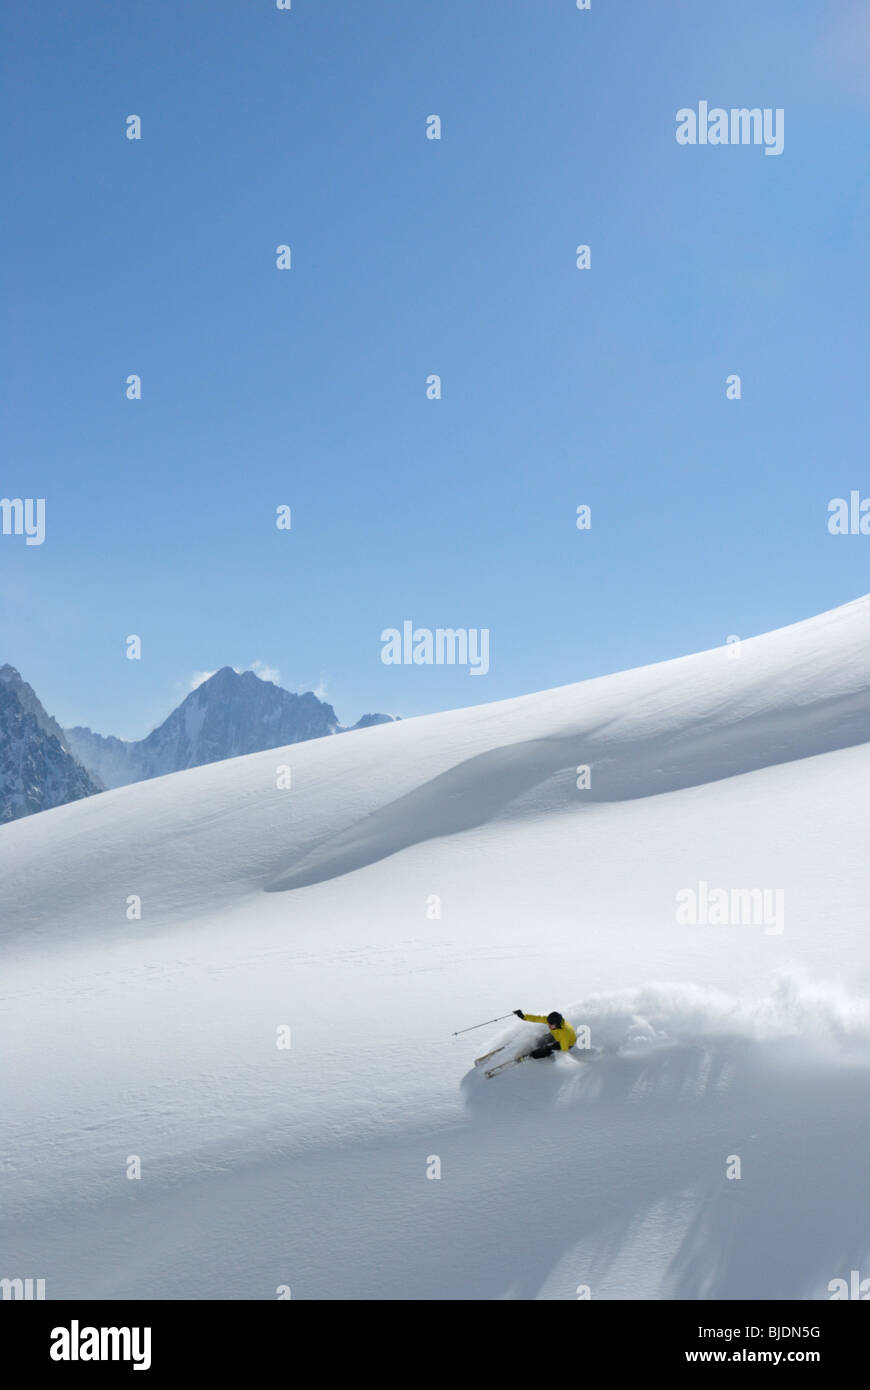 Skiing in fresh powder snow, Chamonix, France - Stock Image